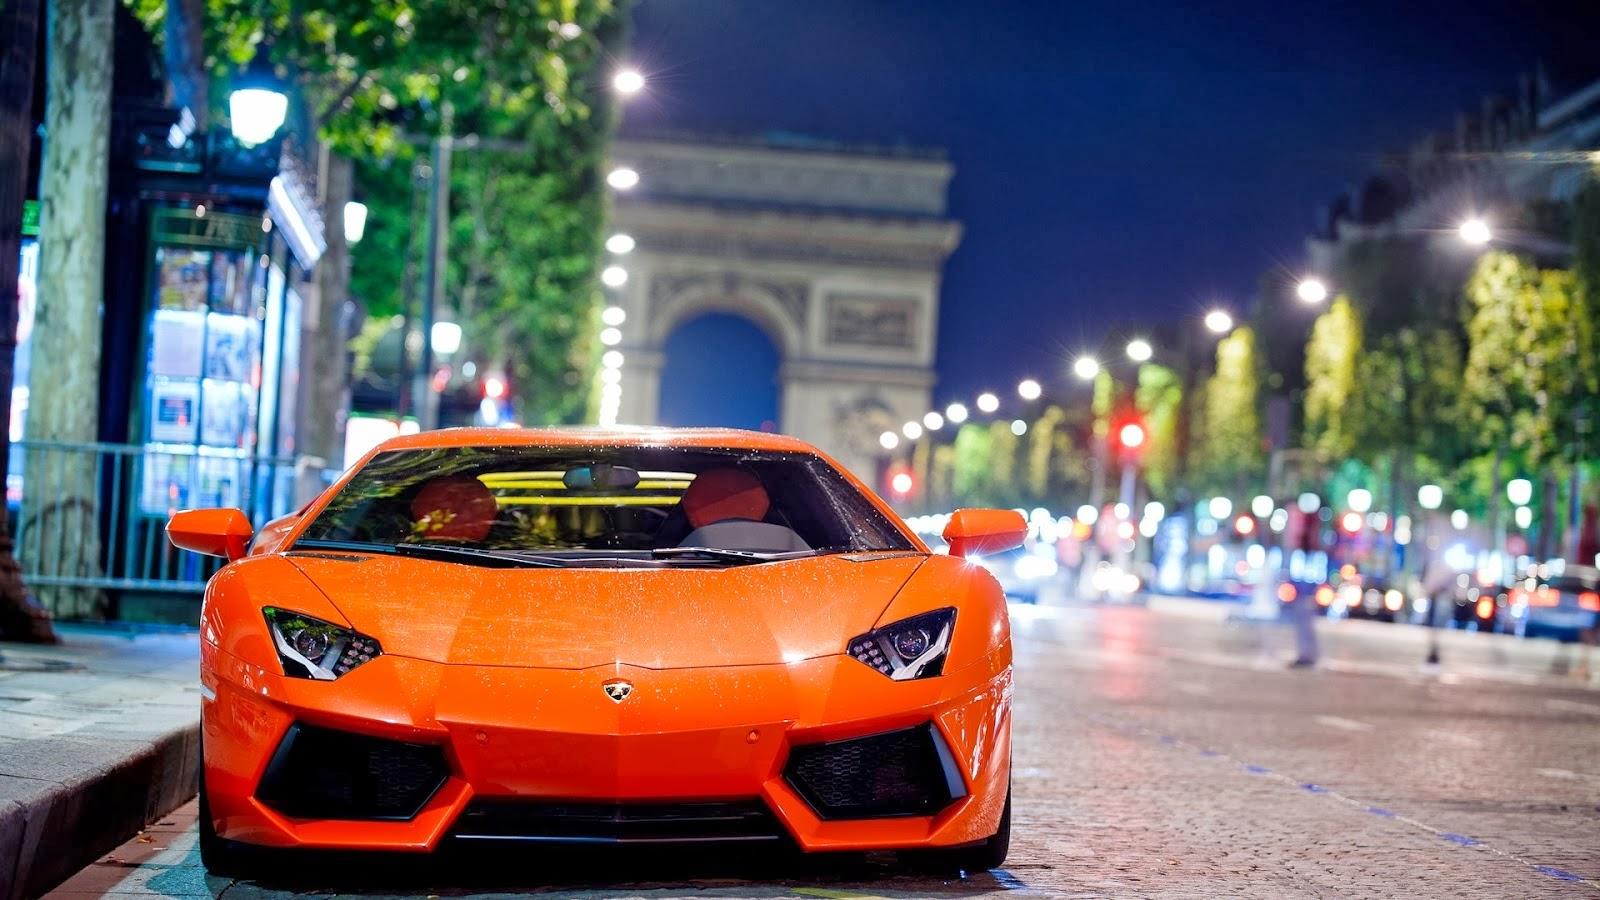 all hot informations: download lamborghini cars hd wallpapers 1080p